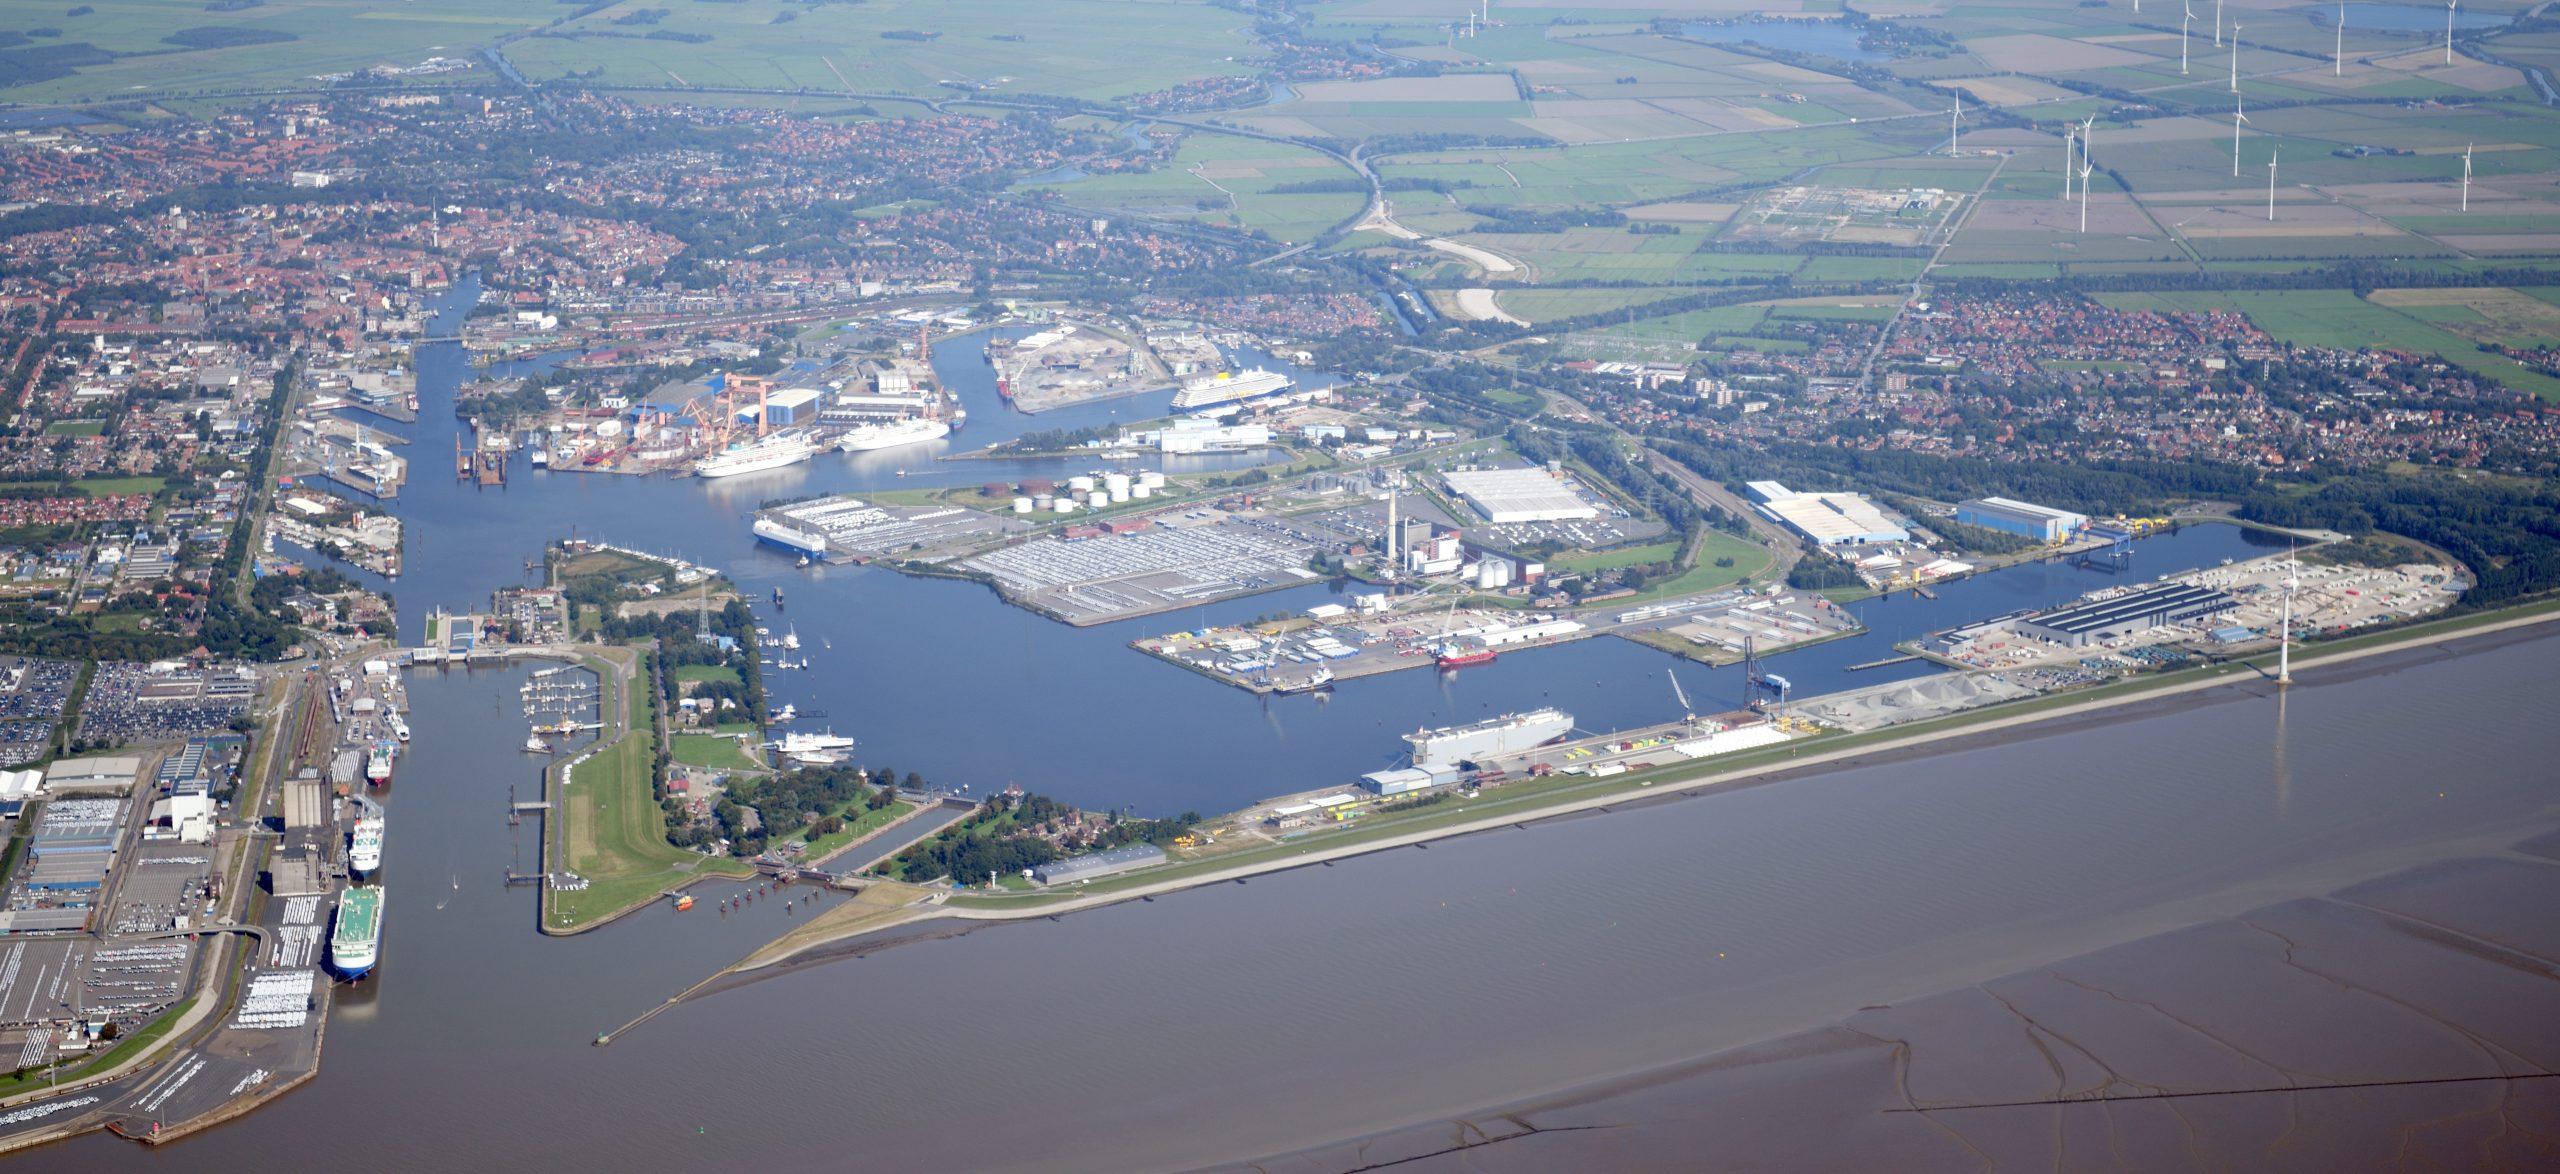 https://seaports.de/content/uploads/Luftaufnahme_Emden_komplett_schmal-scaled.jpg